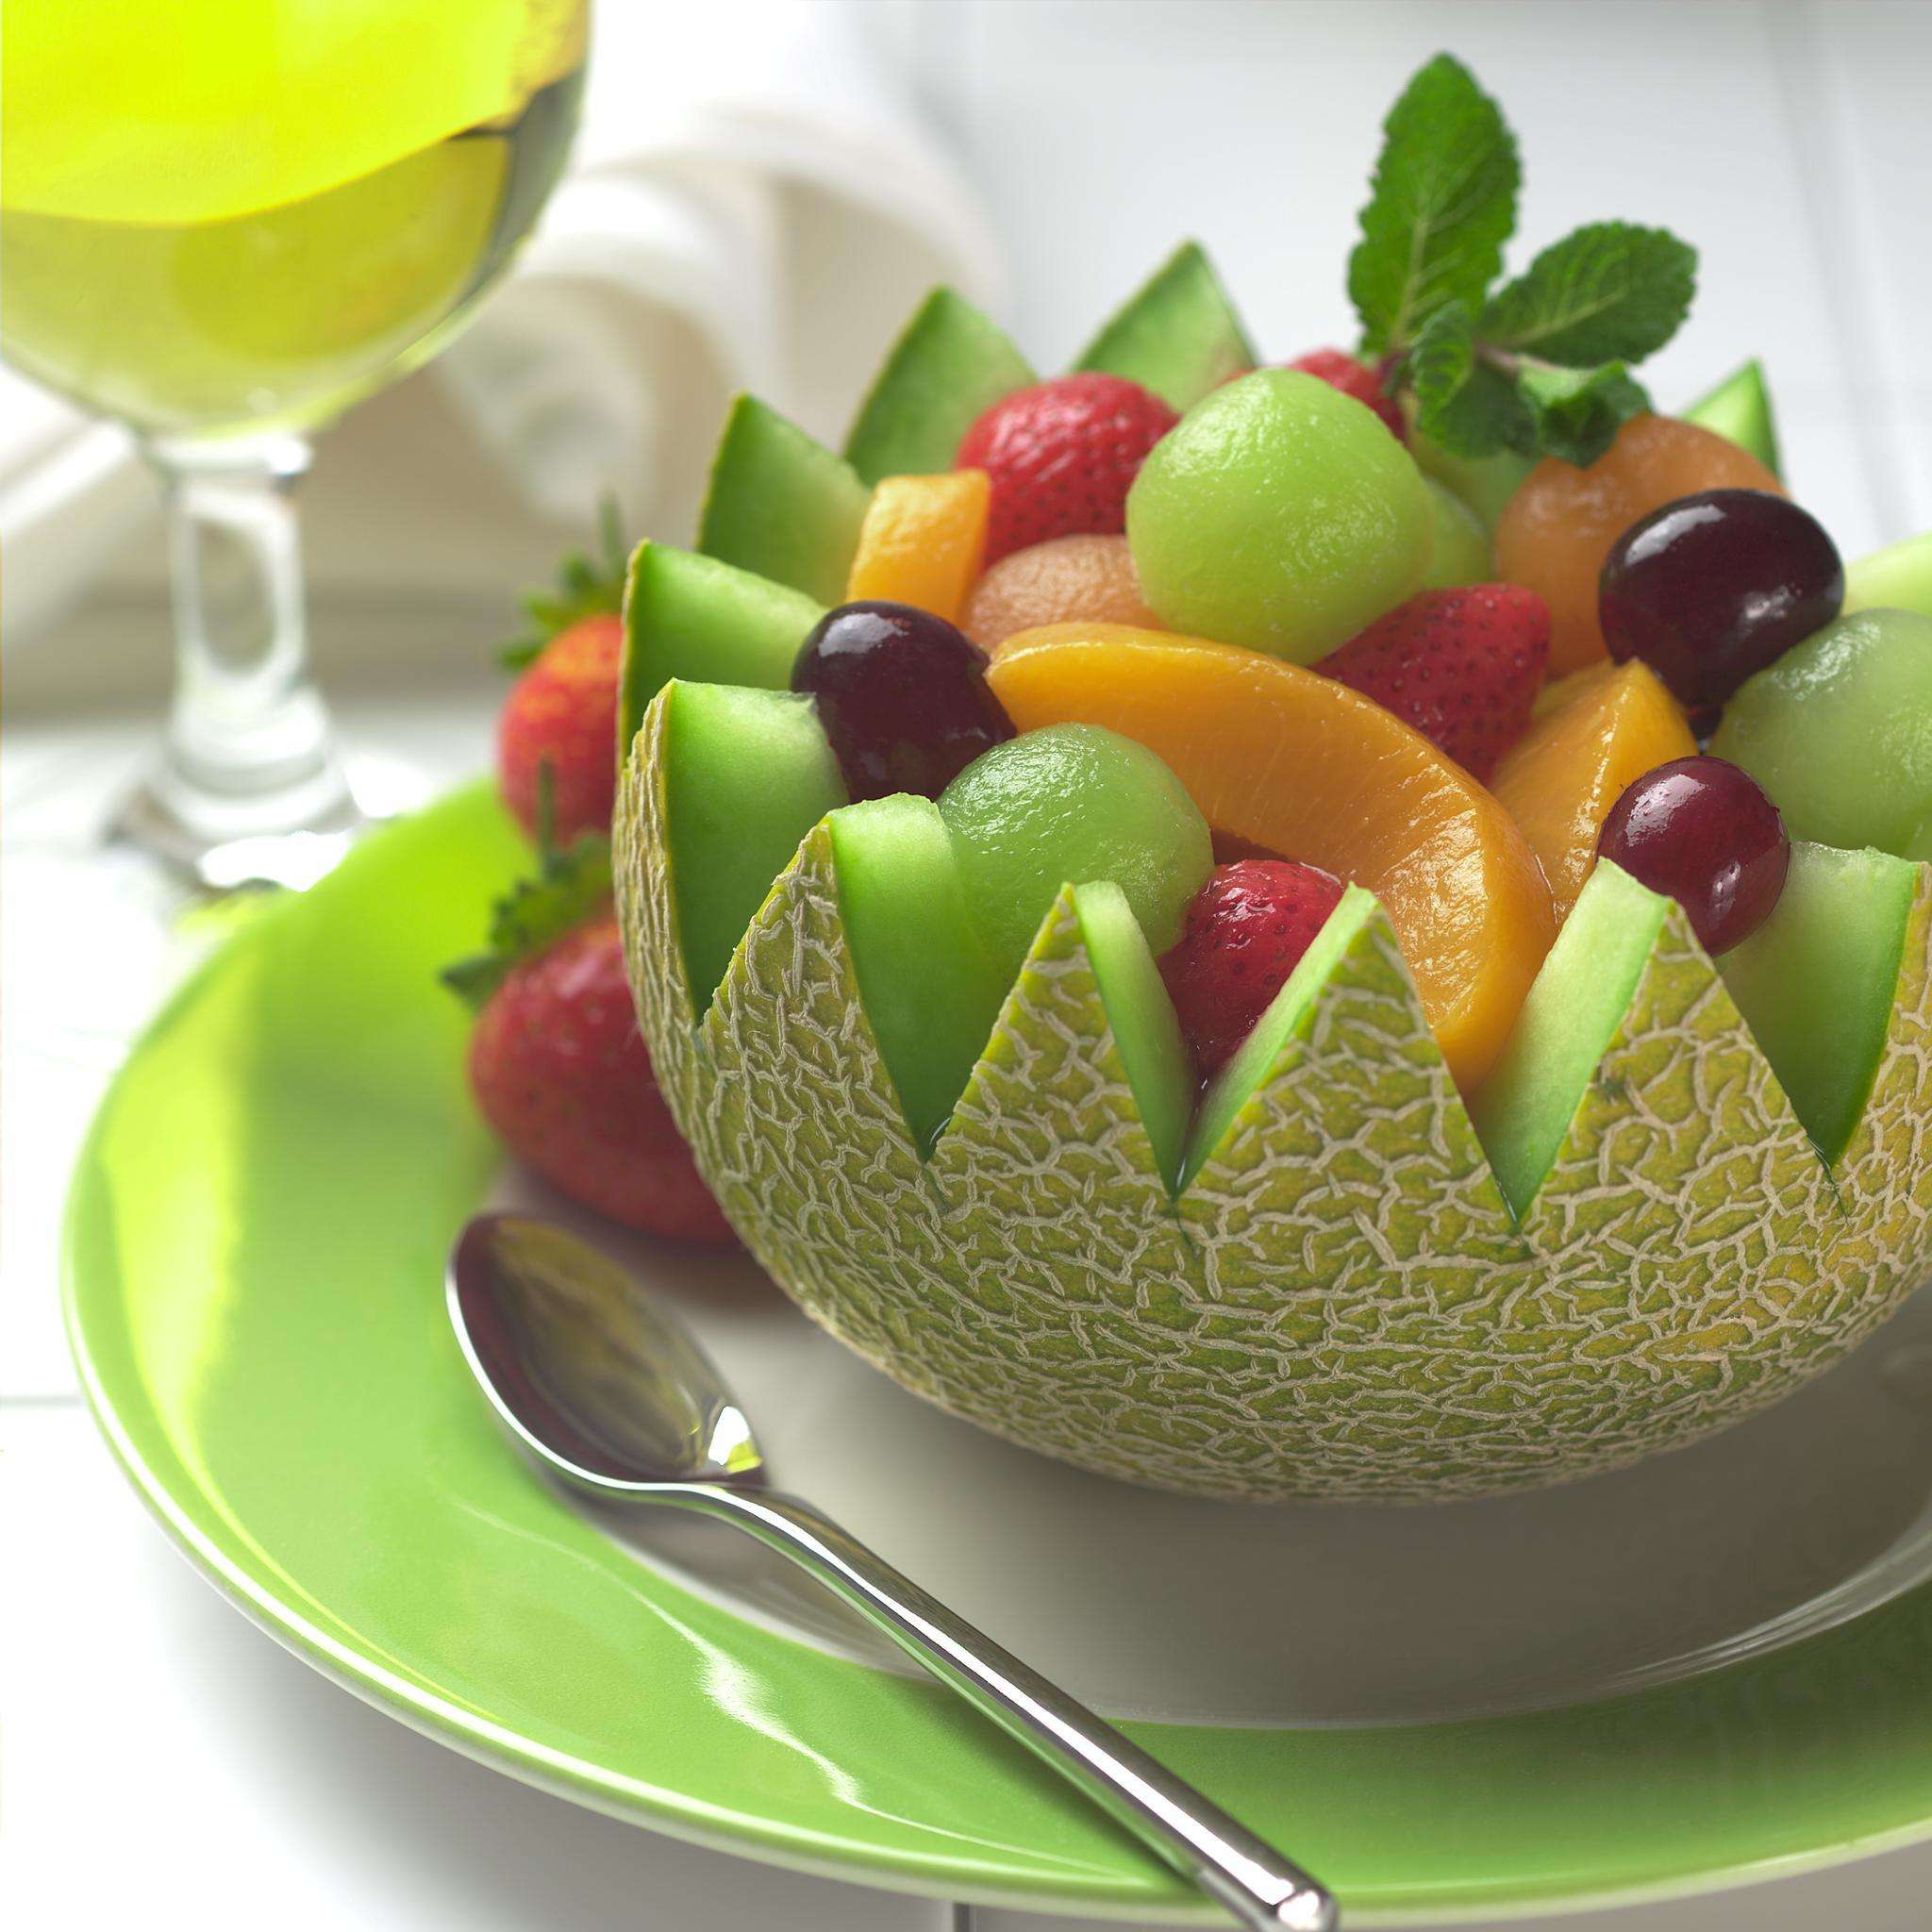 Tuna, Tomato, Cucumber Salad - Shockingly Delicious Fruit salad decoration photos